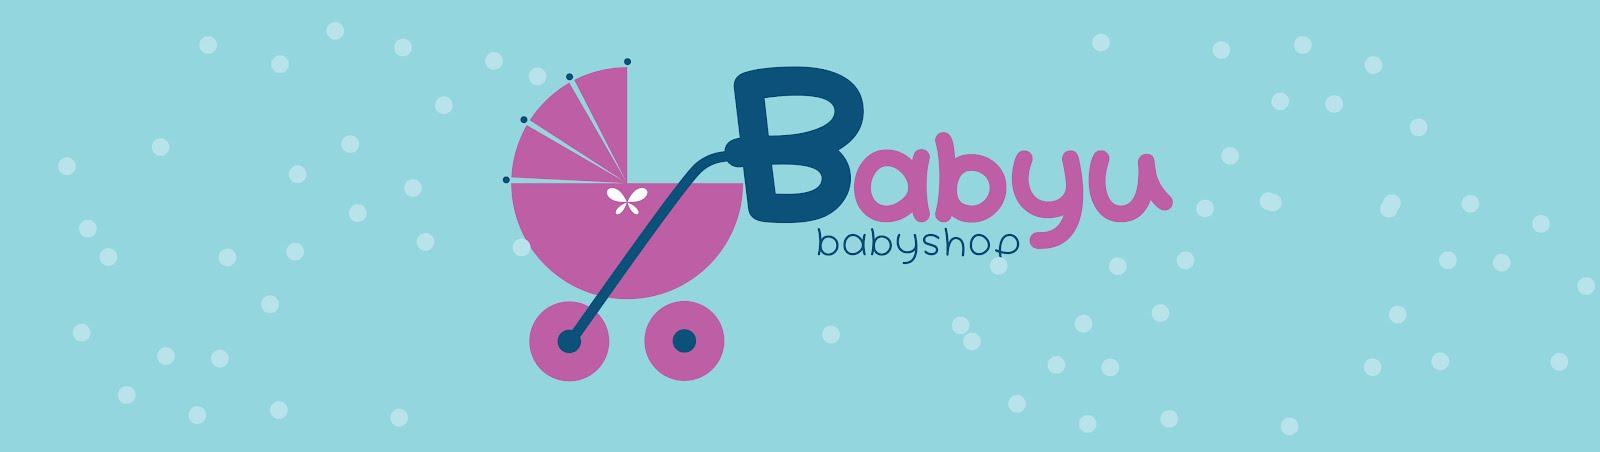 babyubabyshop